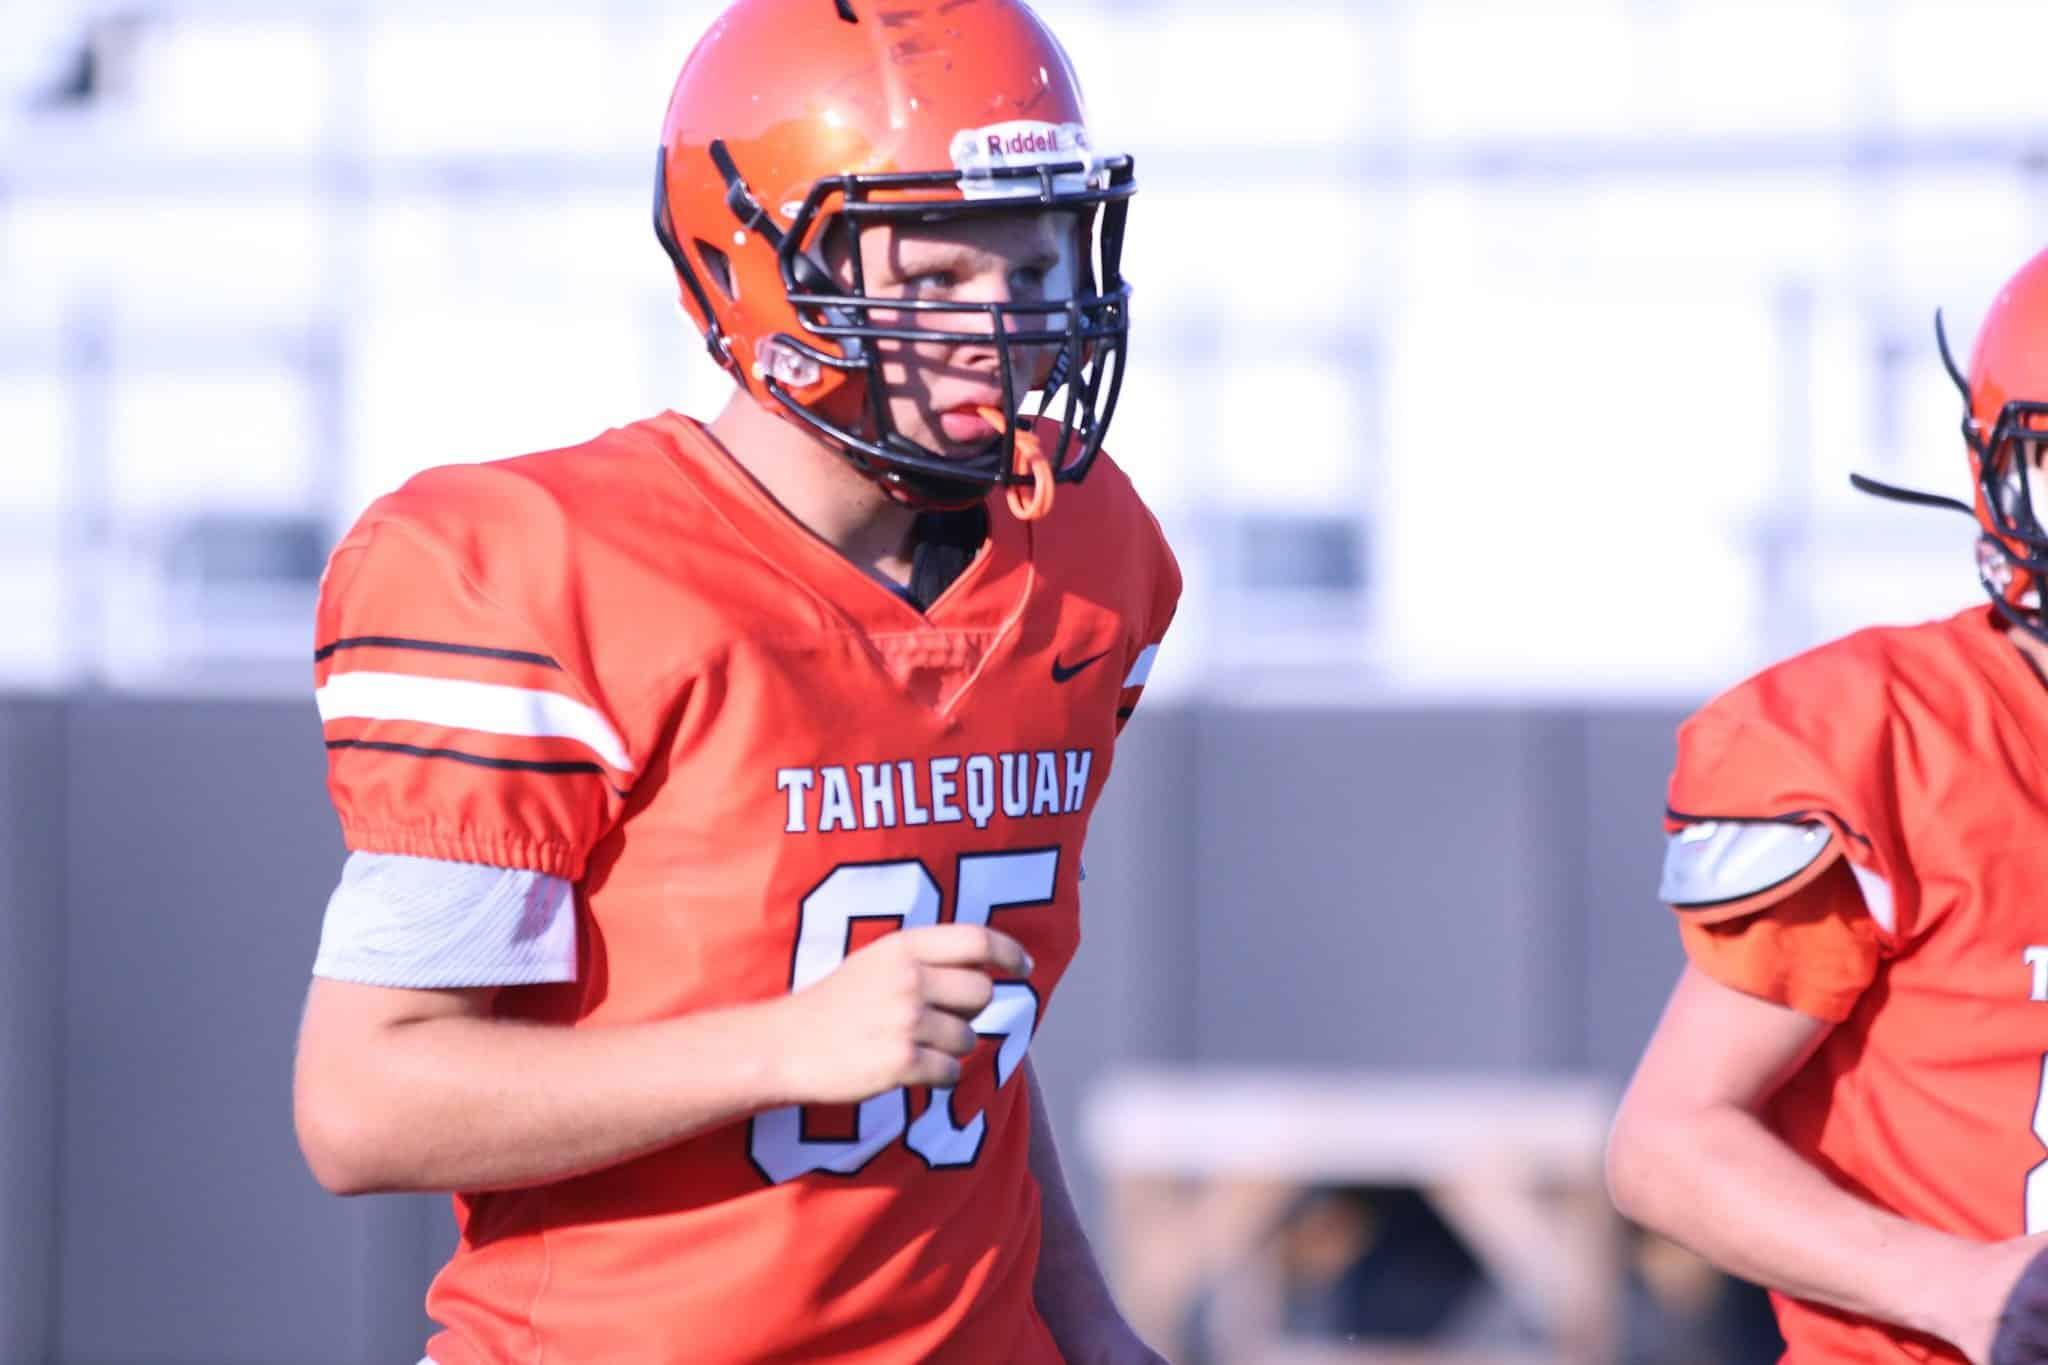 Tahlequah High School Gets New Jerseys